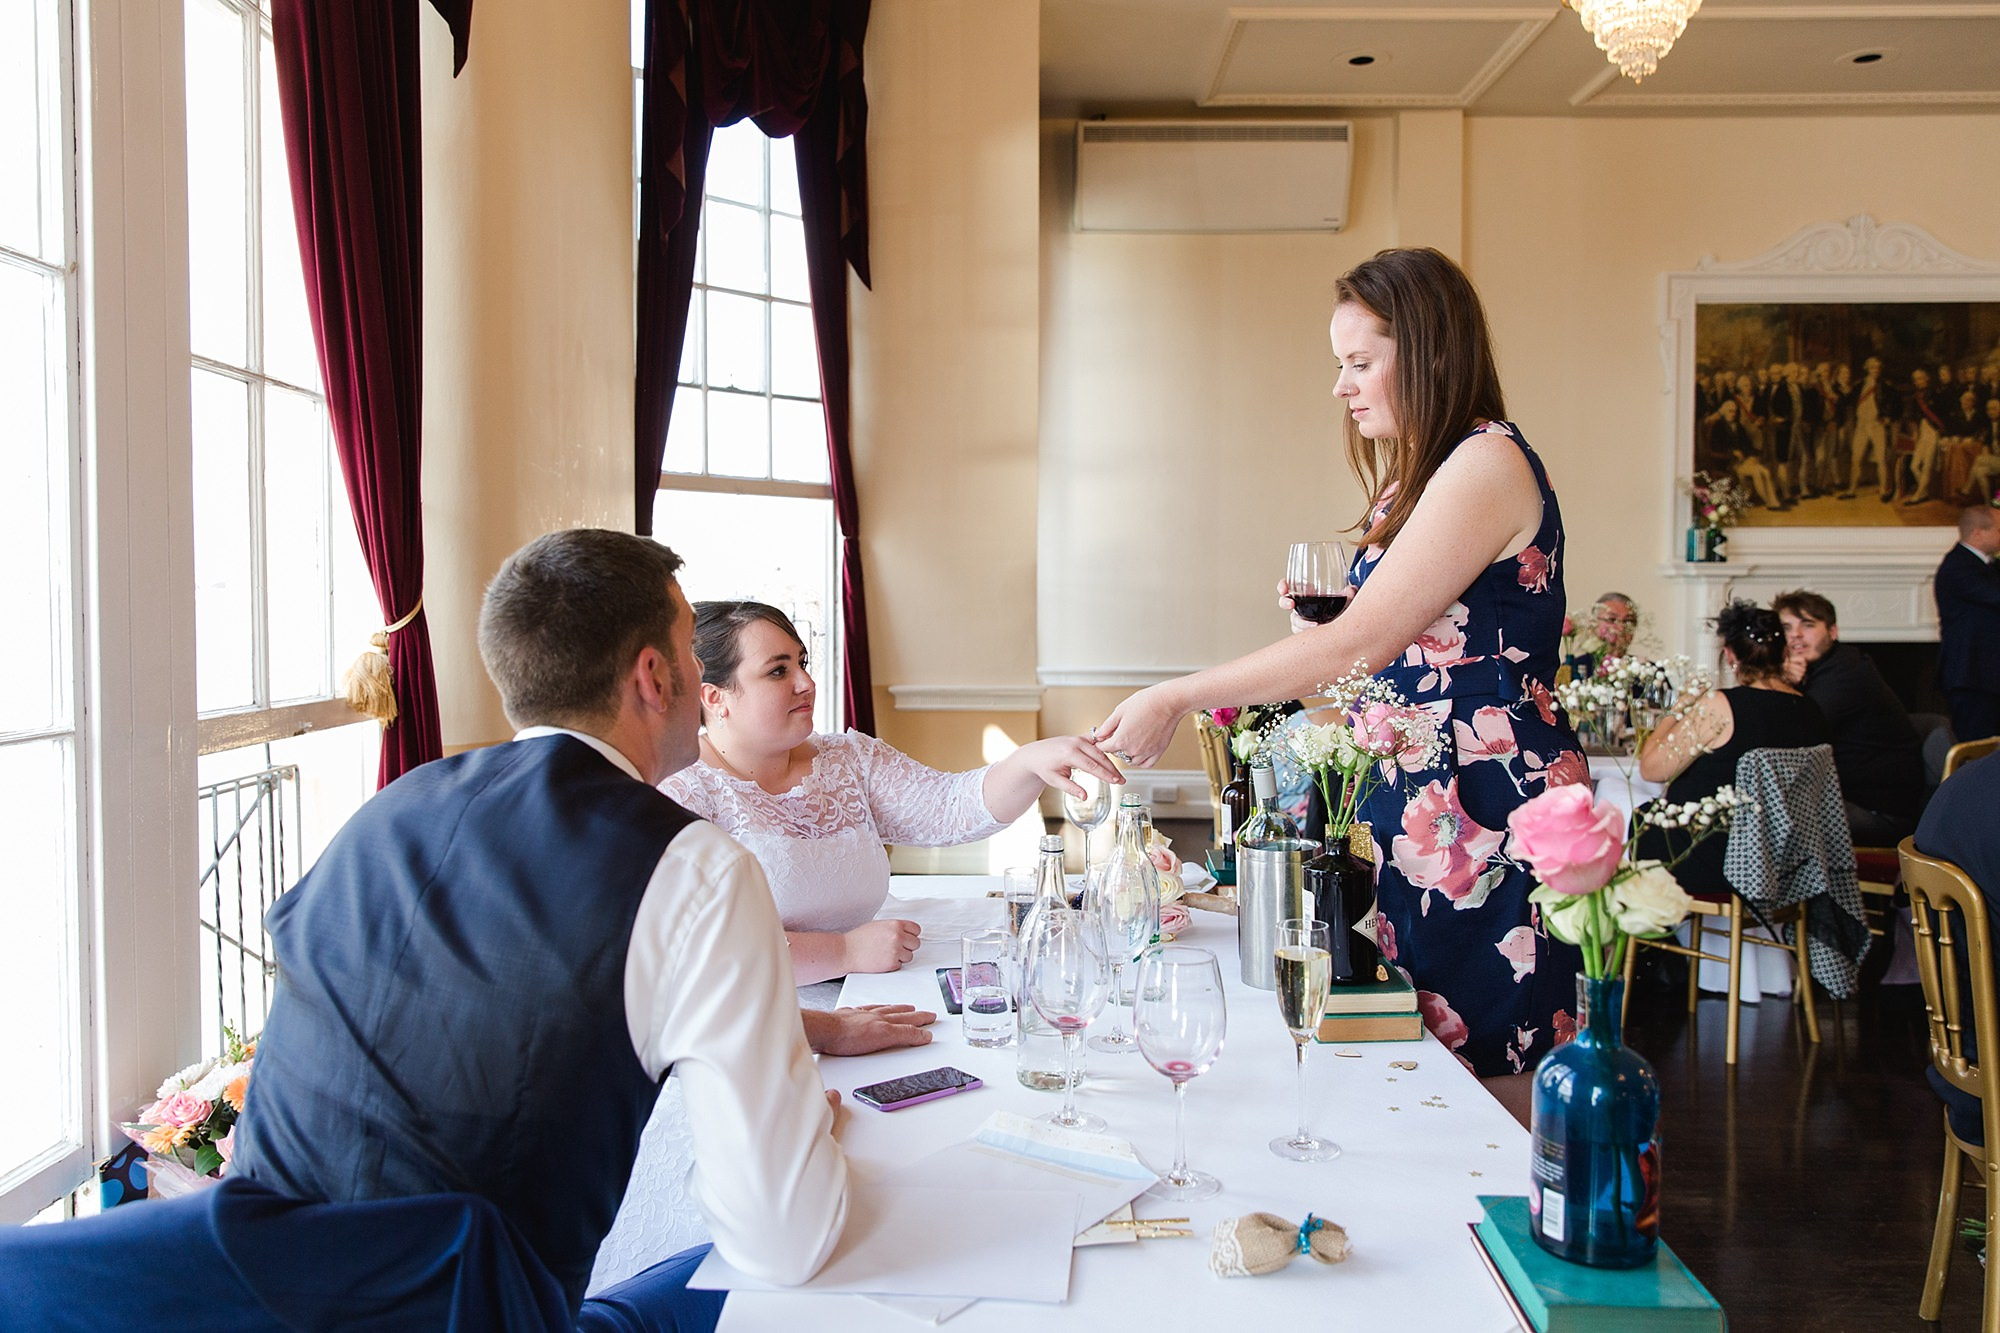 Trafalgar Tavern wedding bride showing off her wedding ring